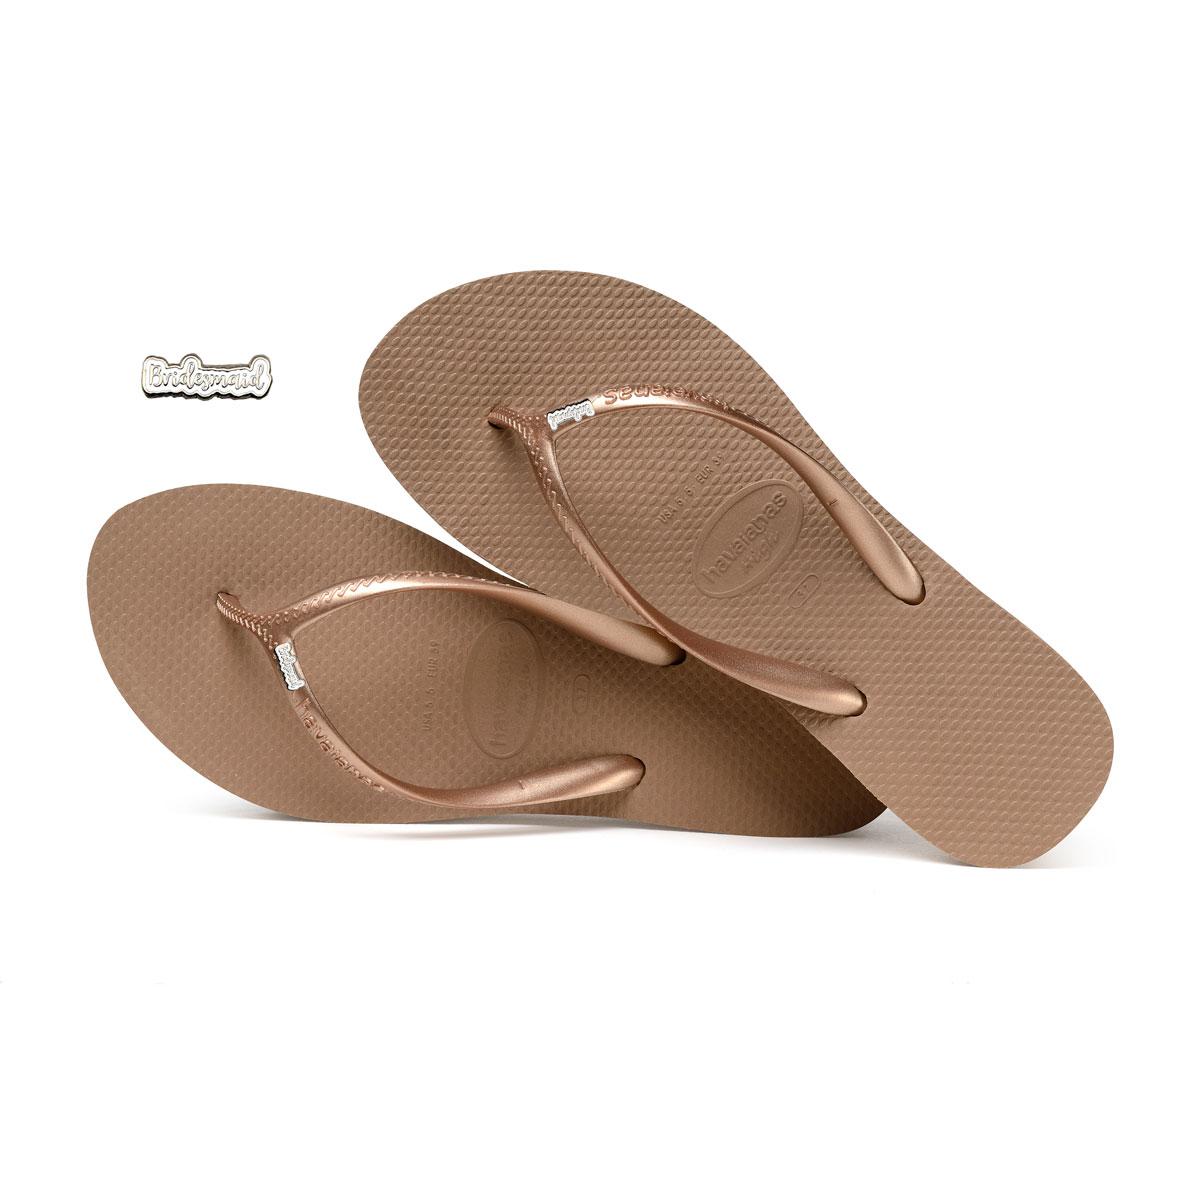 Havaianas Heel Rose Gold Flip-Flops with Silver 'Bridesmaid' Charm